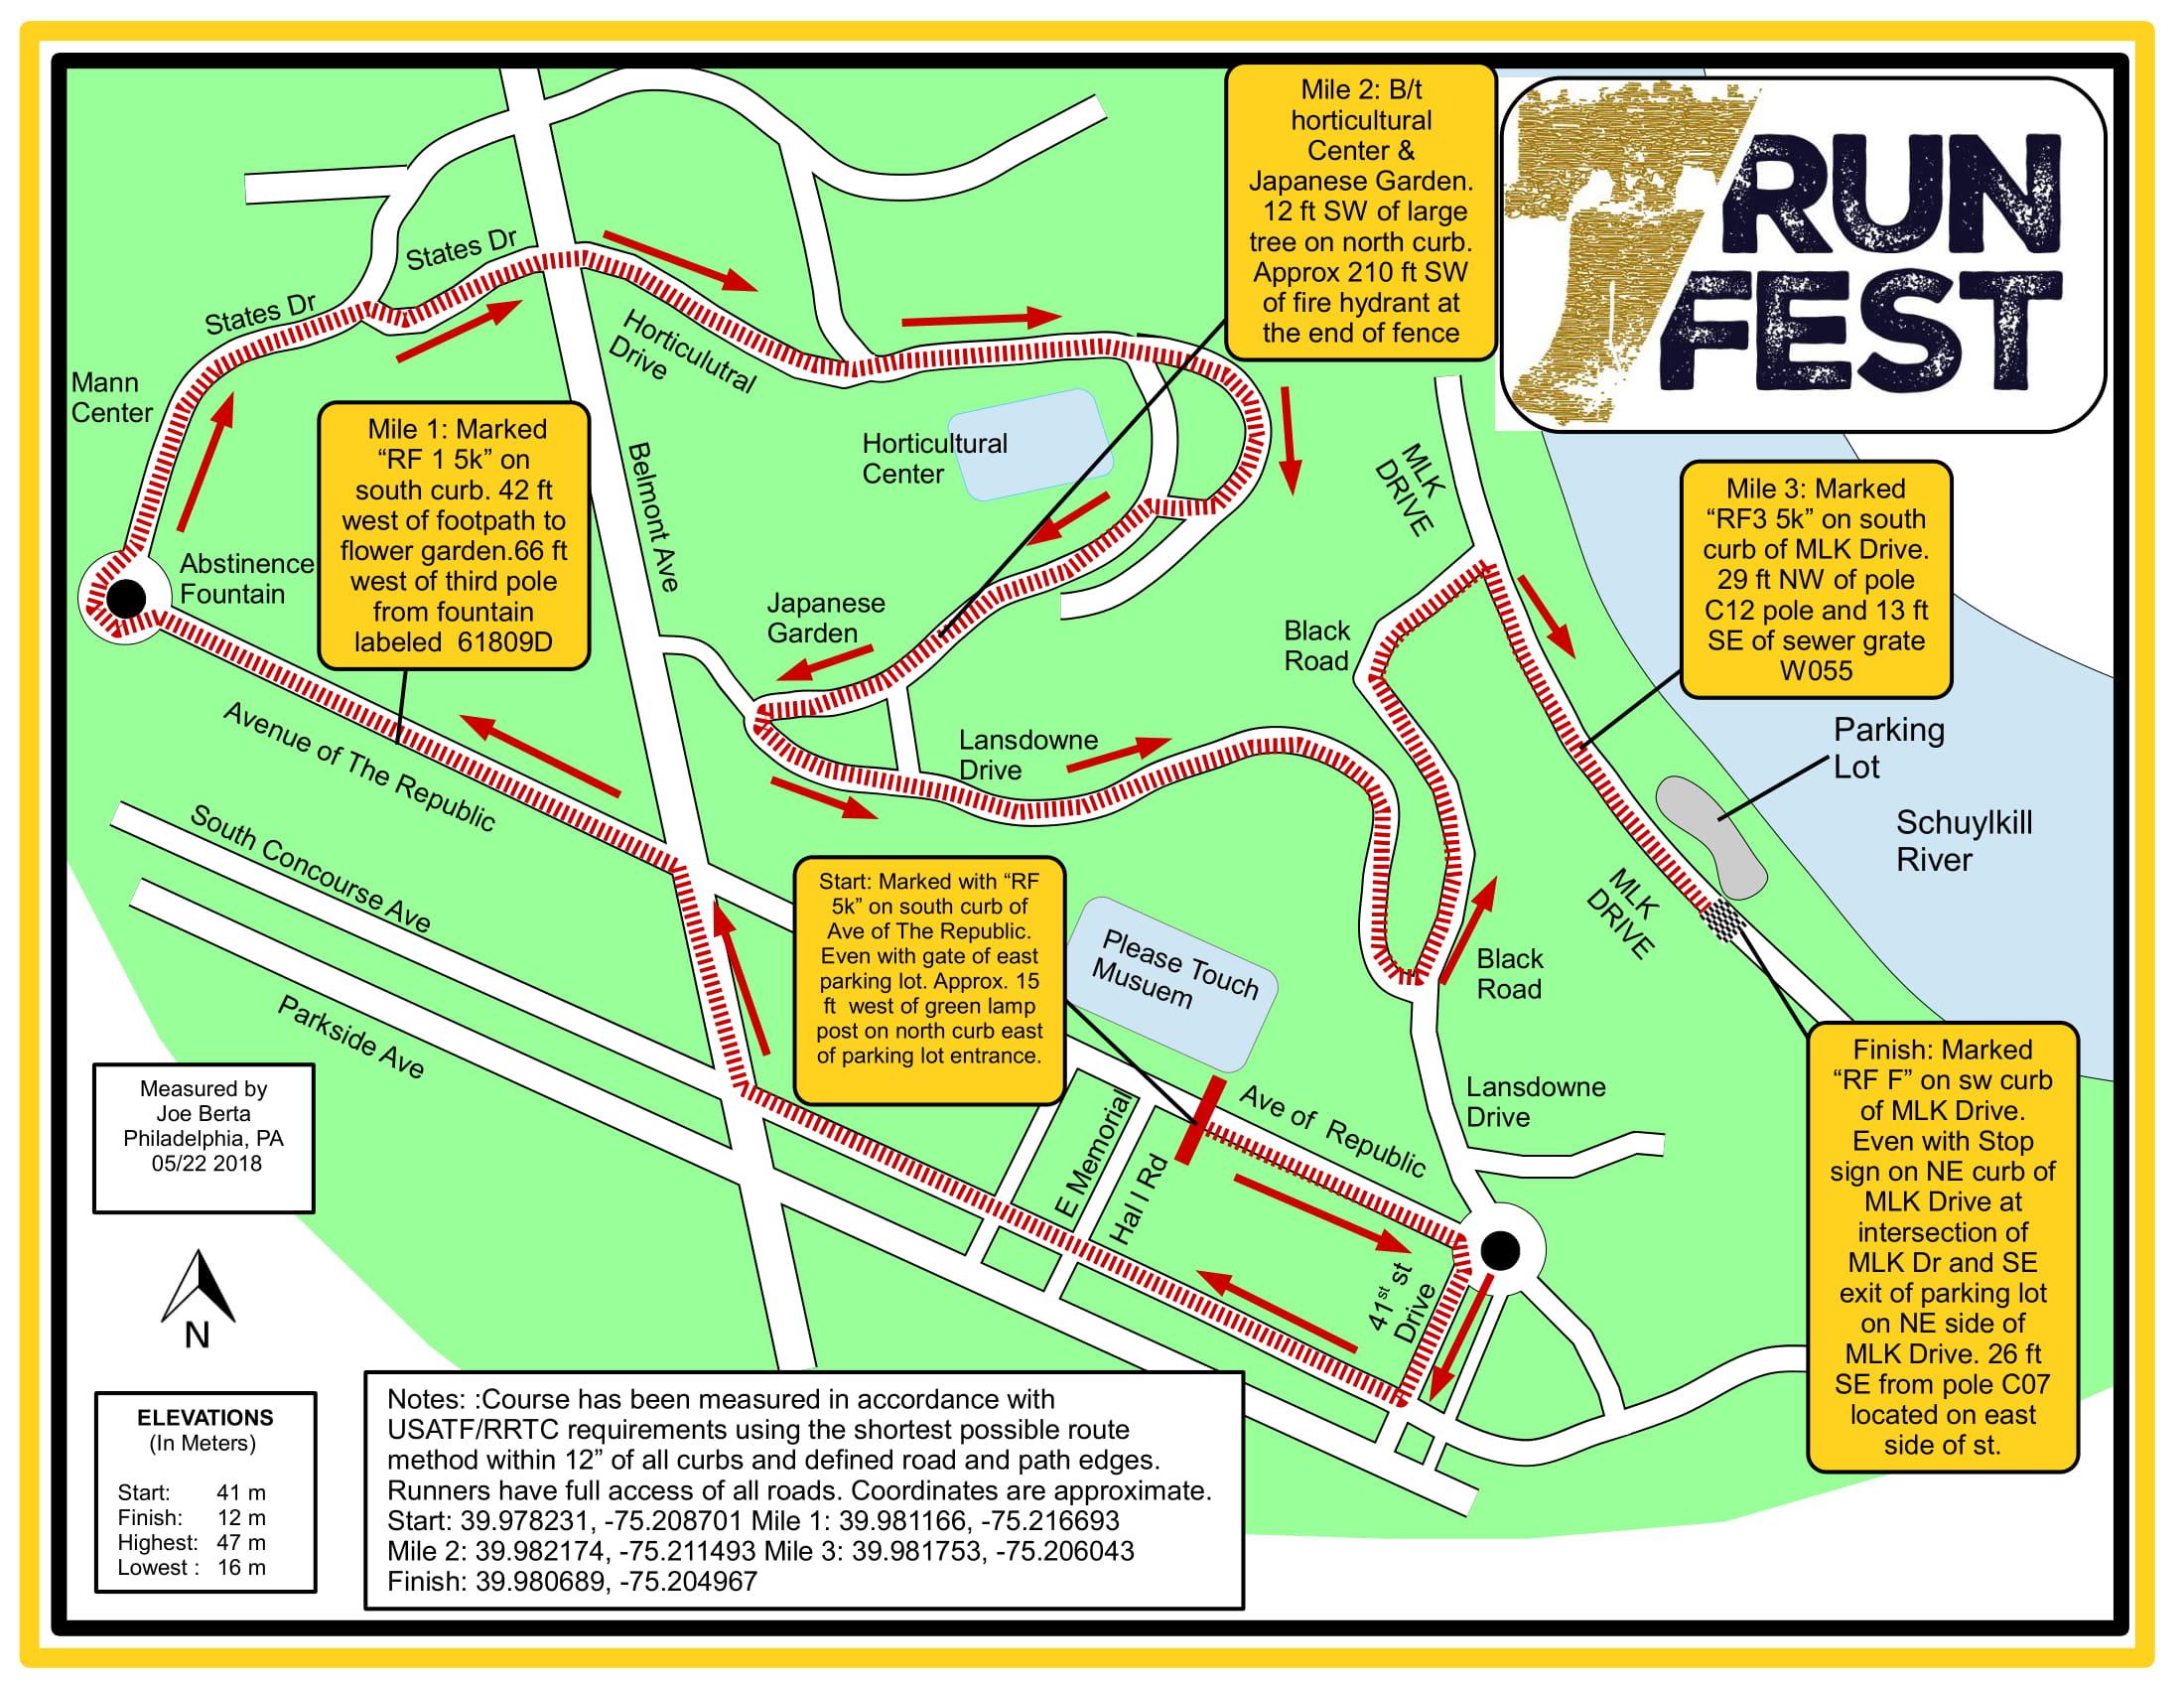 Runfest 5k-1.jpg